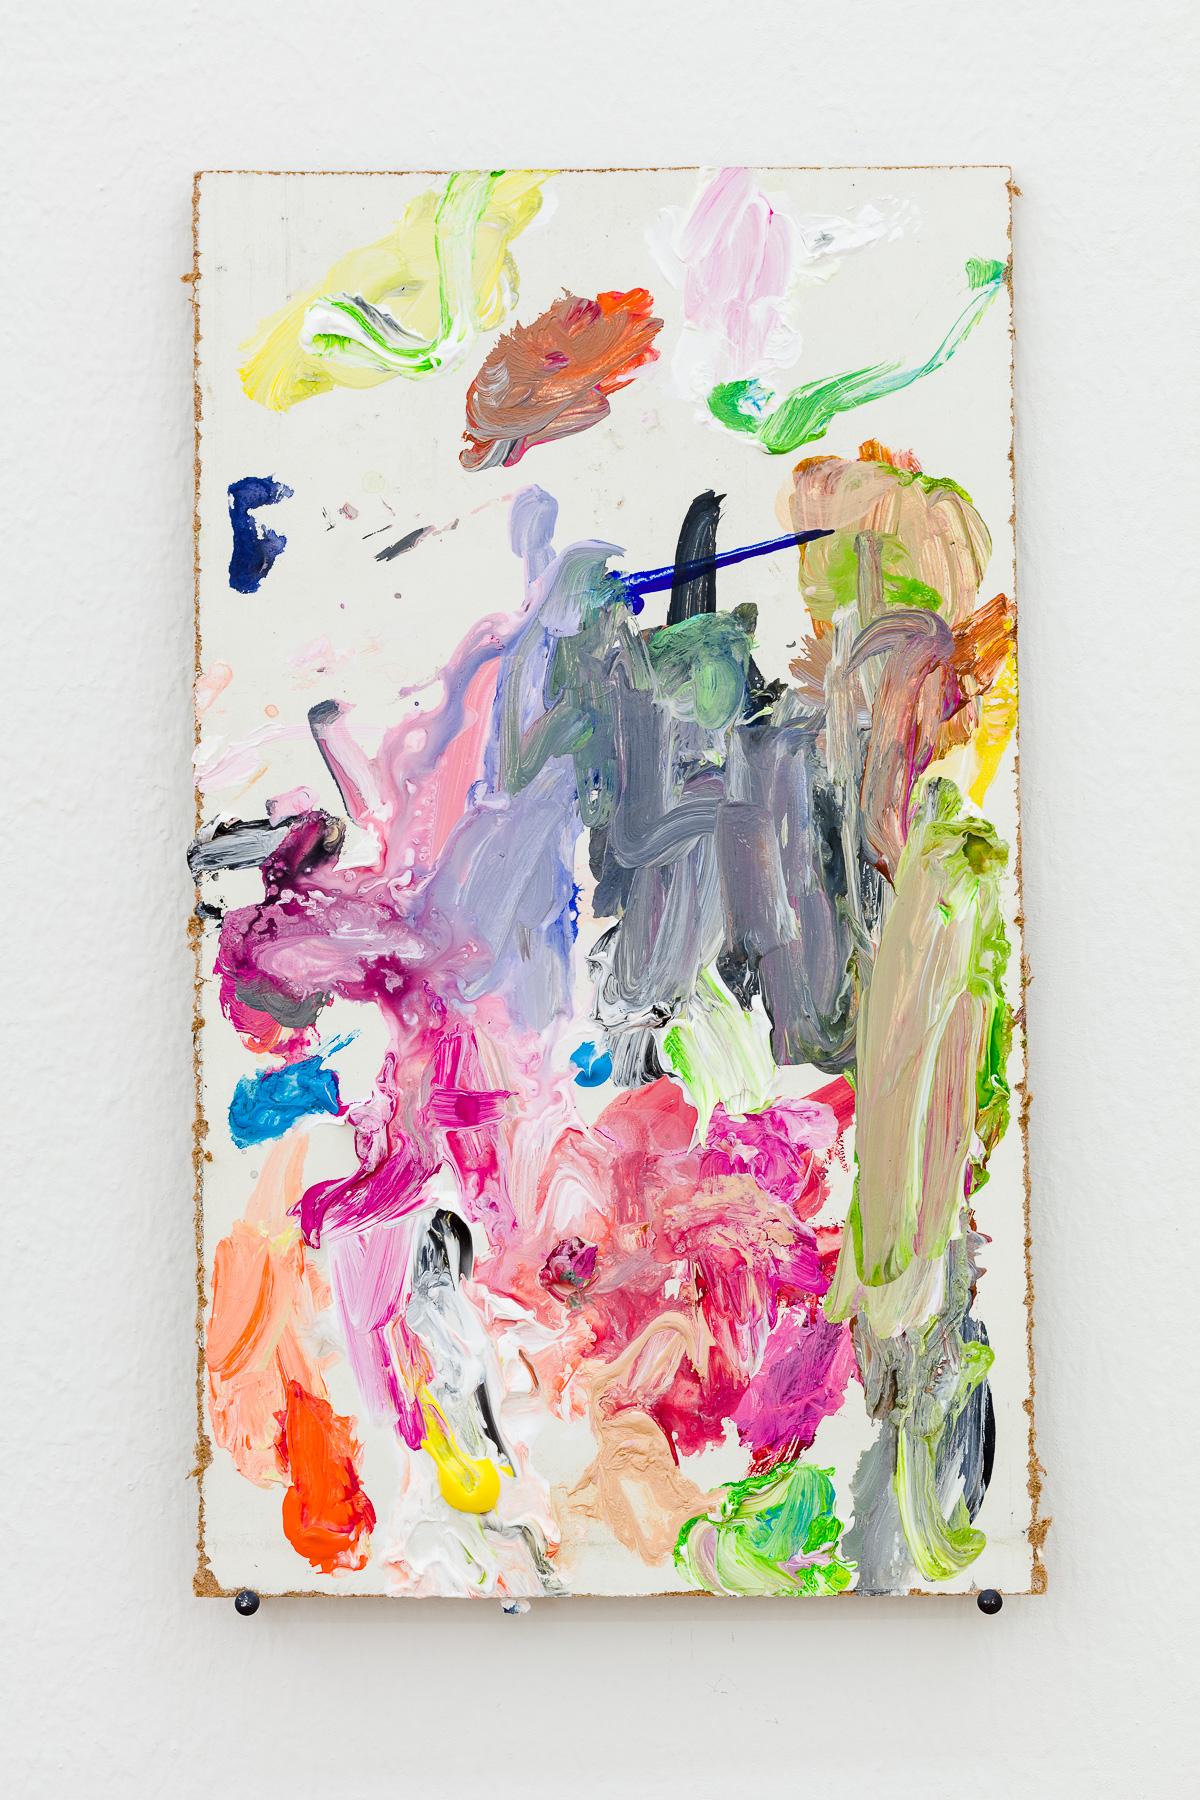 2019_05_20_Elke-Krystufek_Croy-Nielsen_by-kunst-dokumentation-com_012_web.jpg